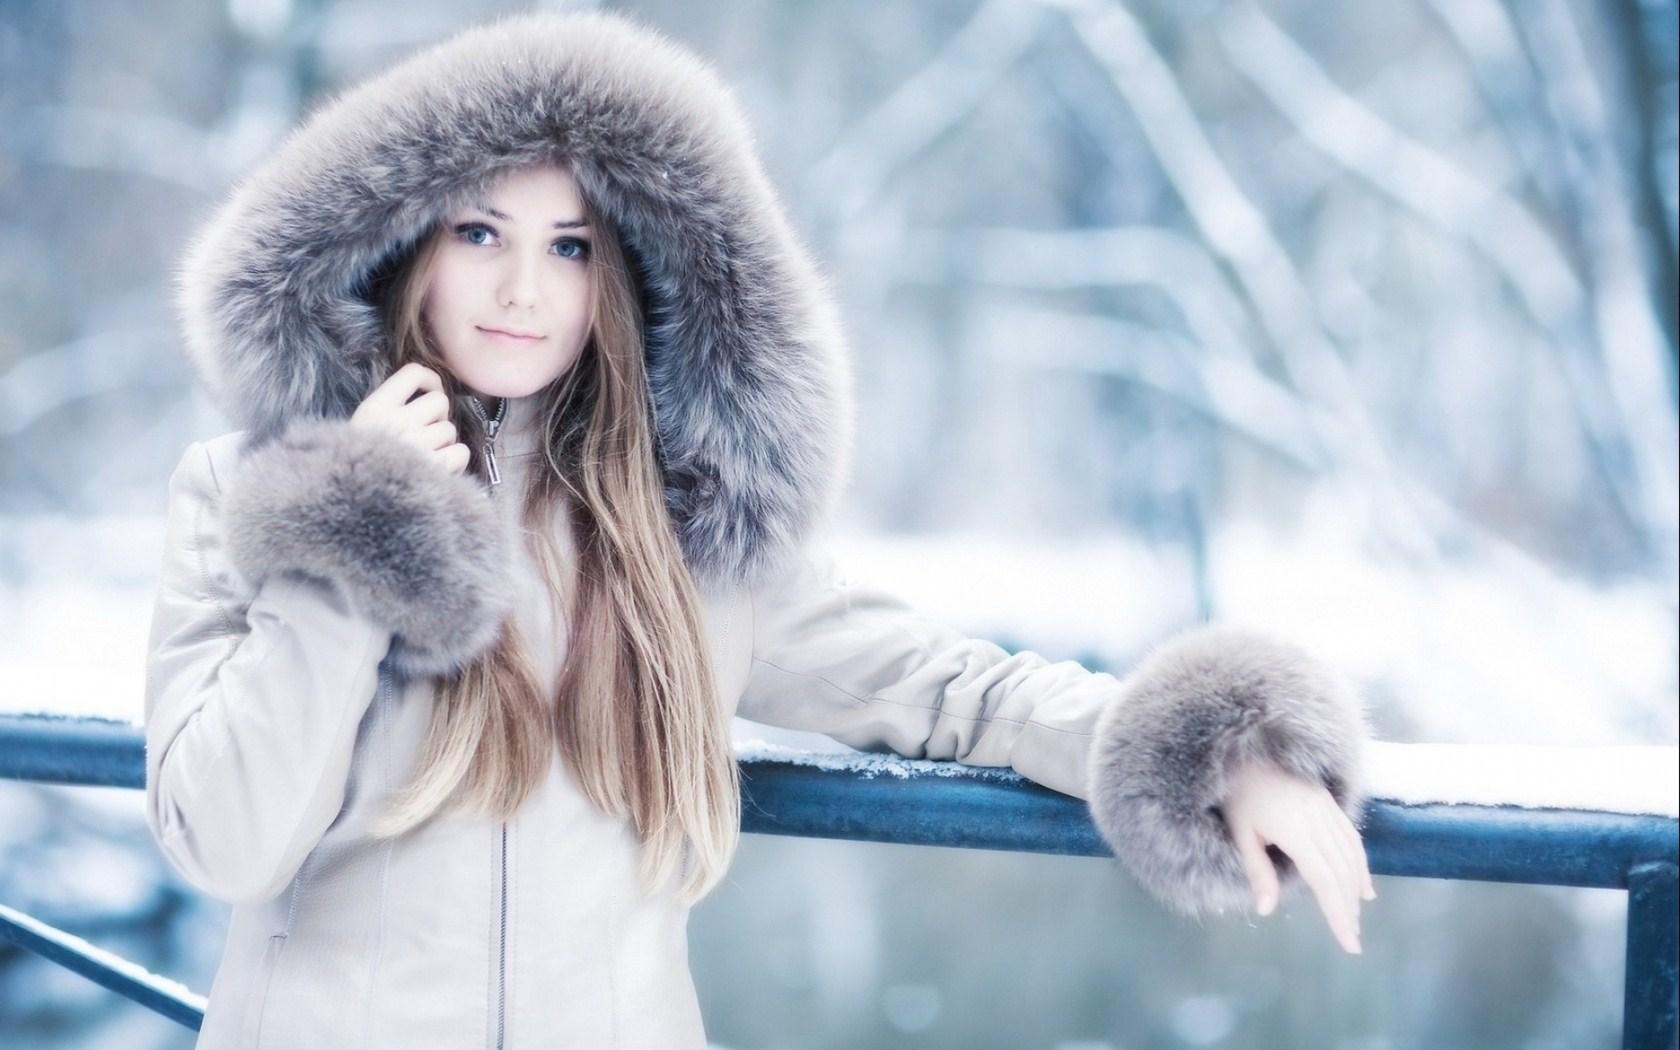 russian girl likes